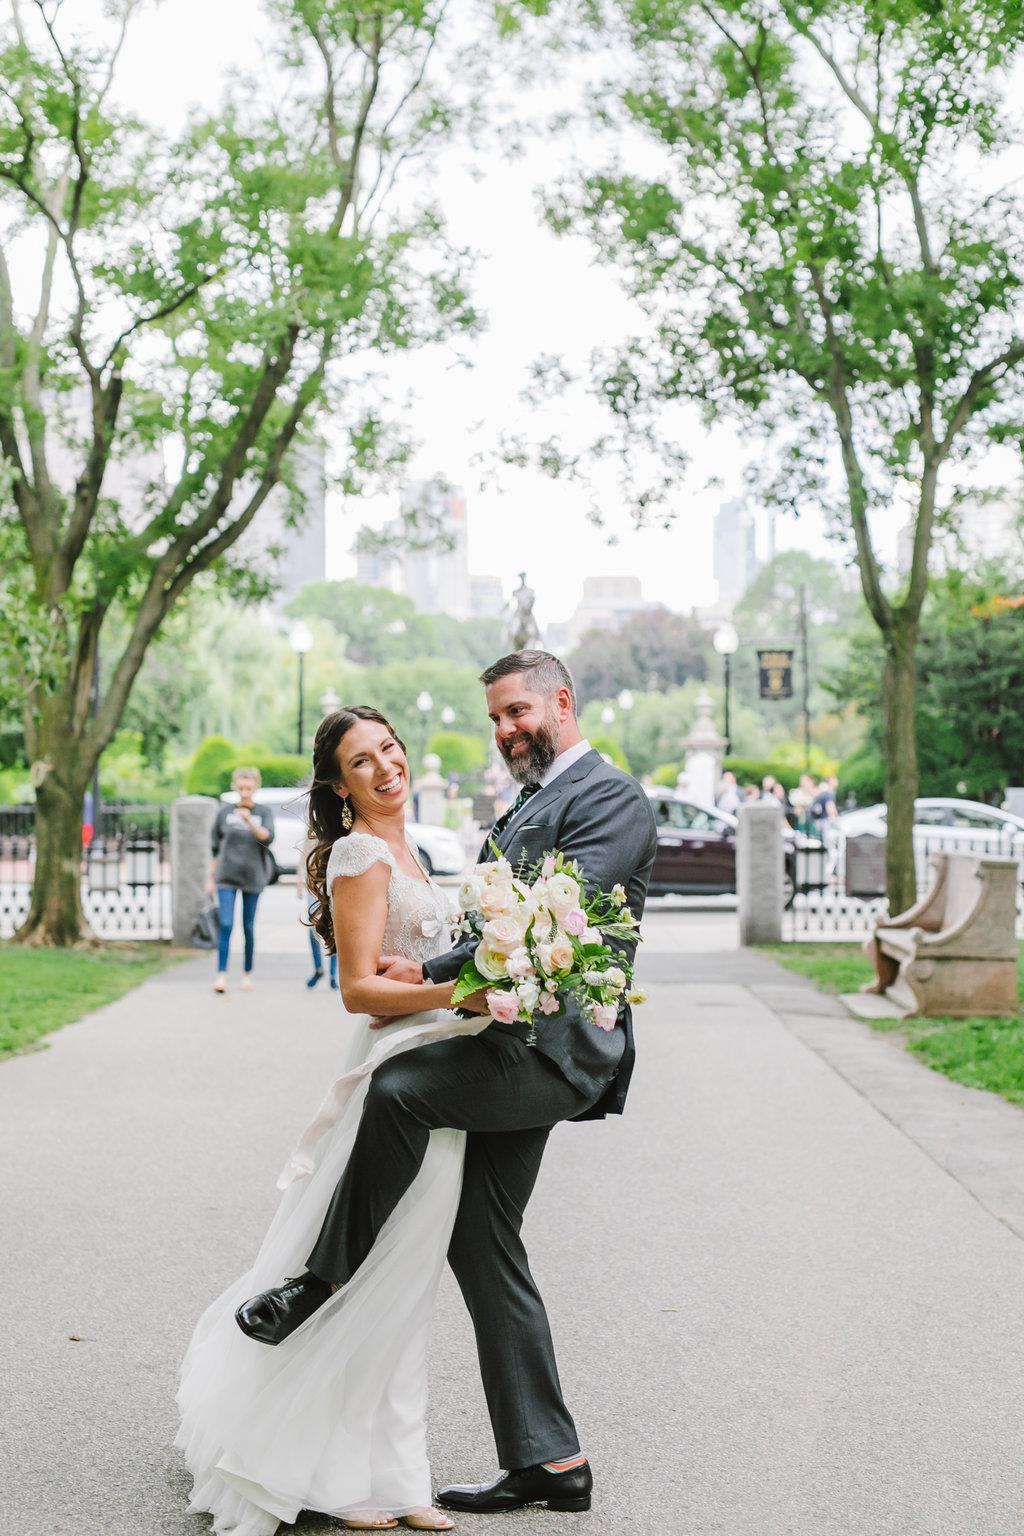 Angie+MattWedding-EmilyTebbettsPhotography-133.jpg